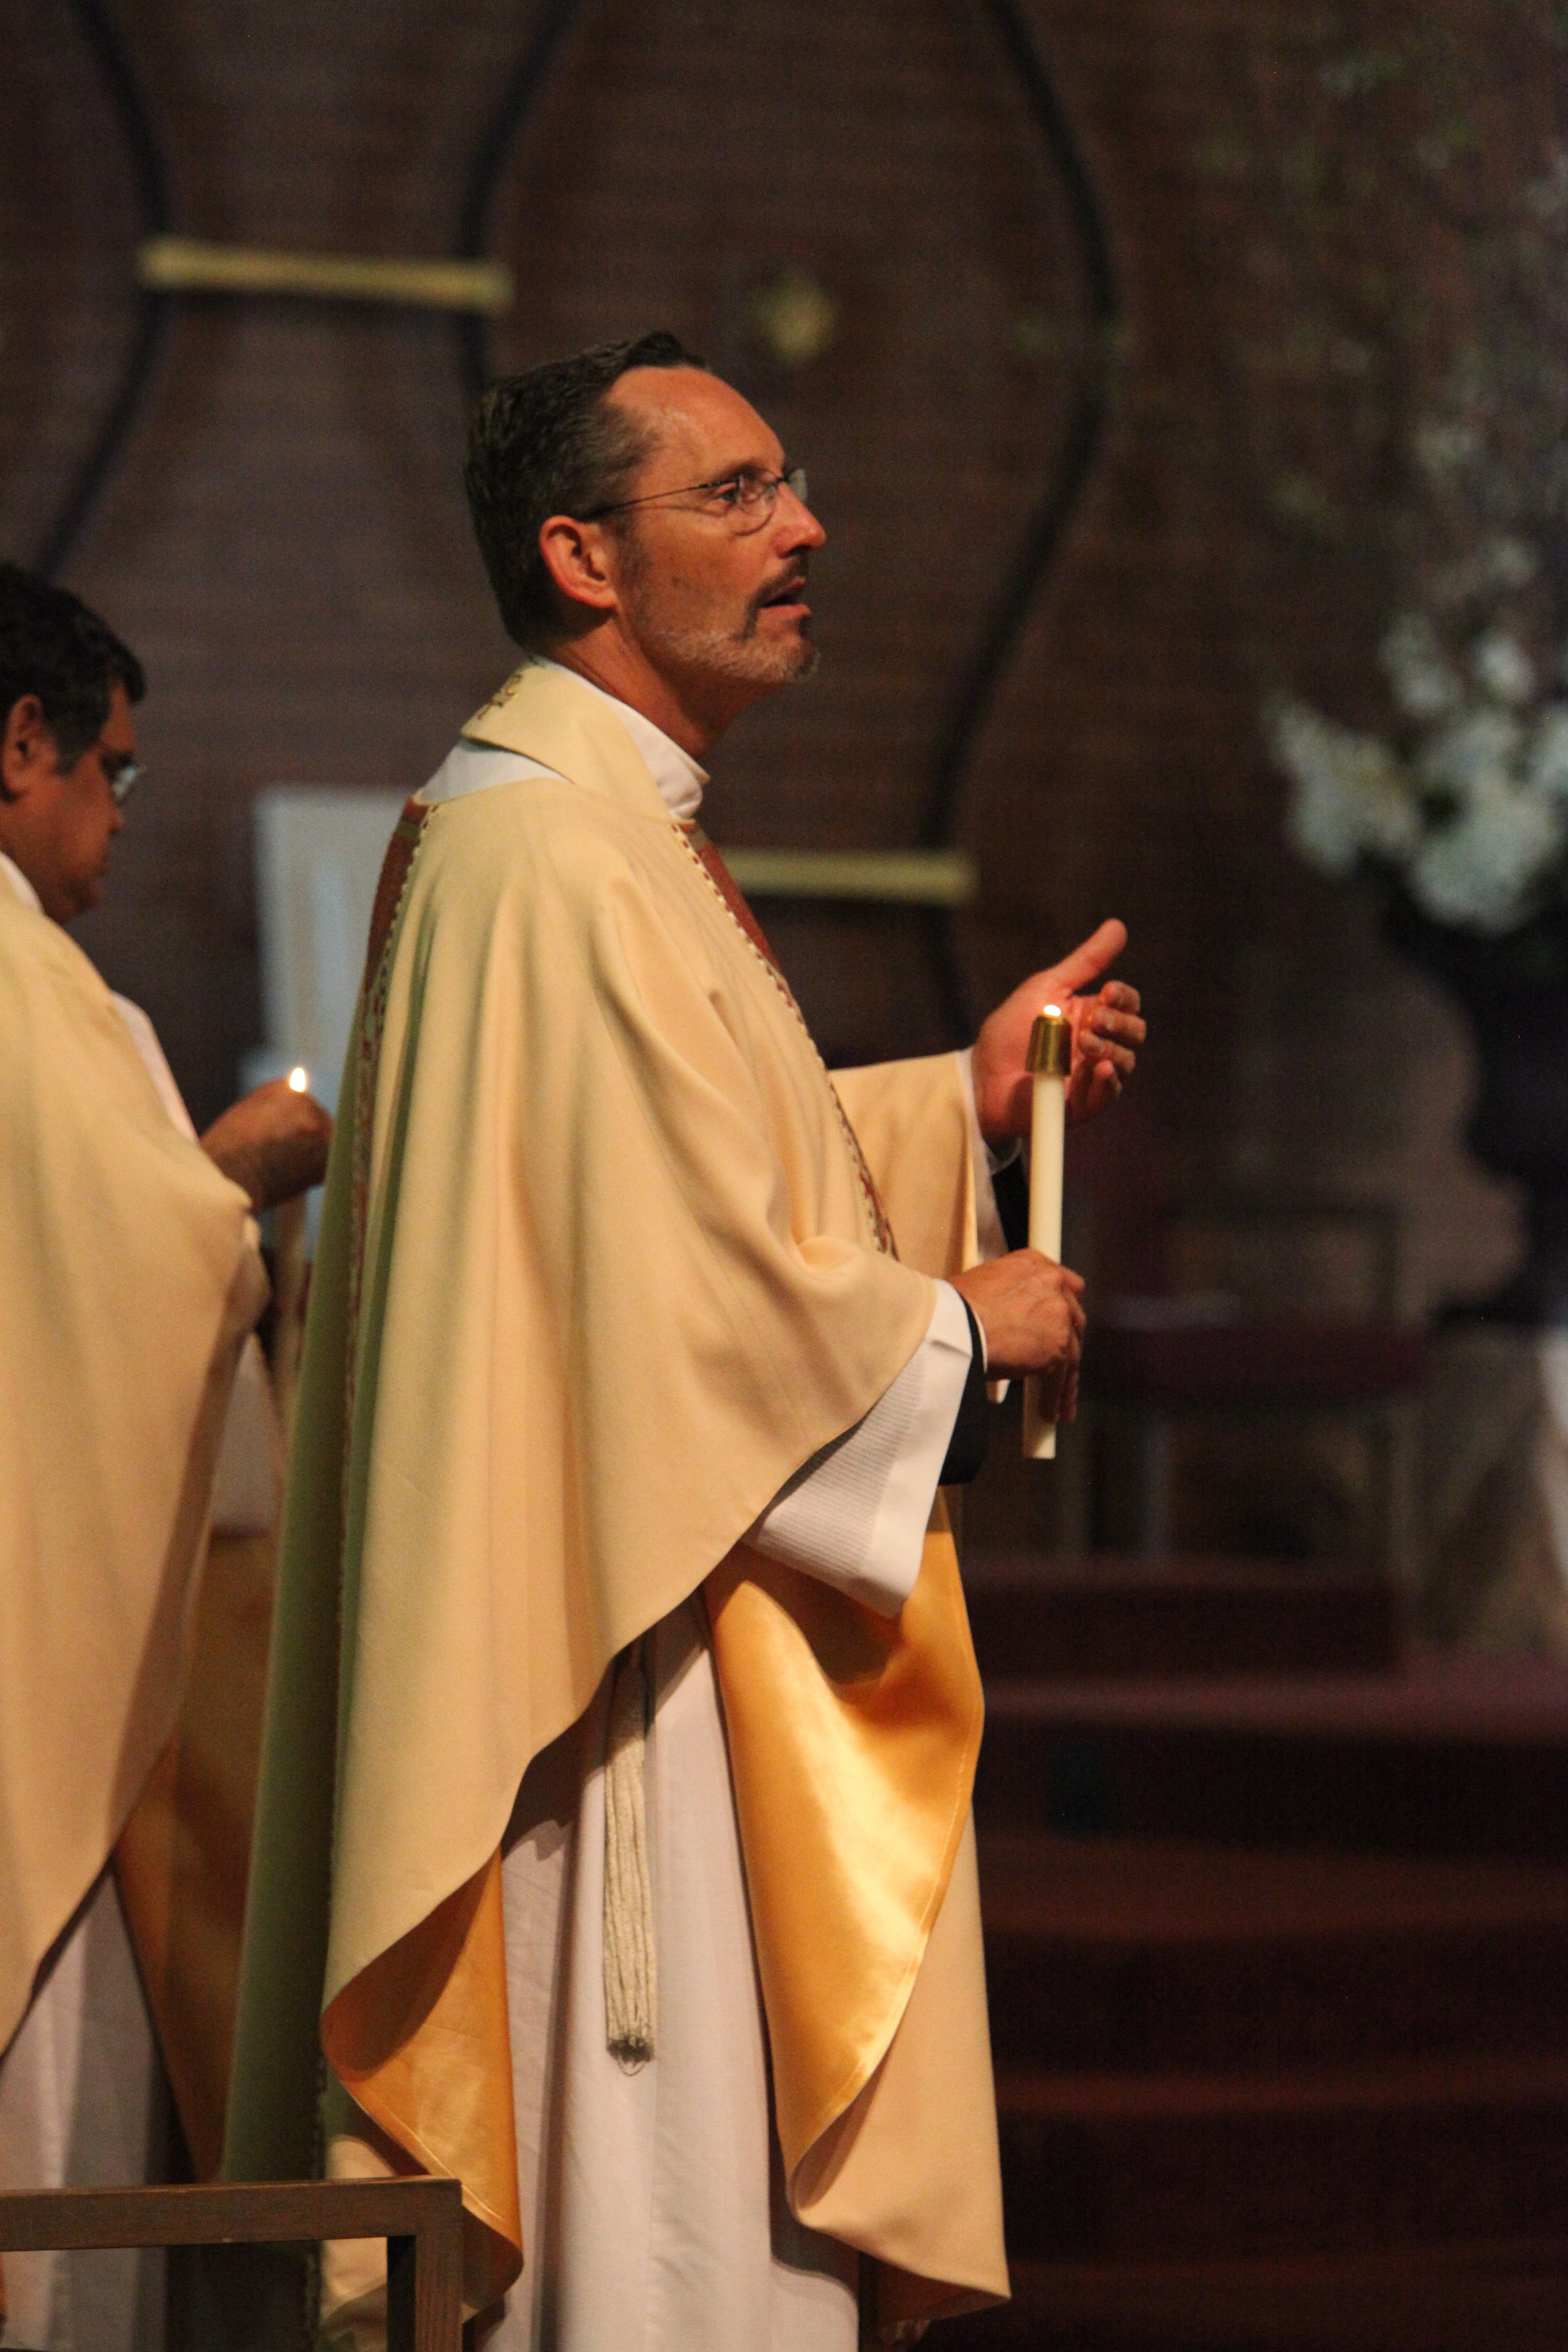 Monsignor Doug Cook